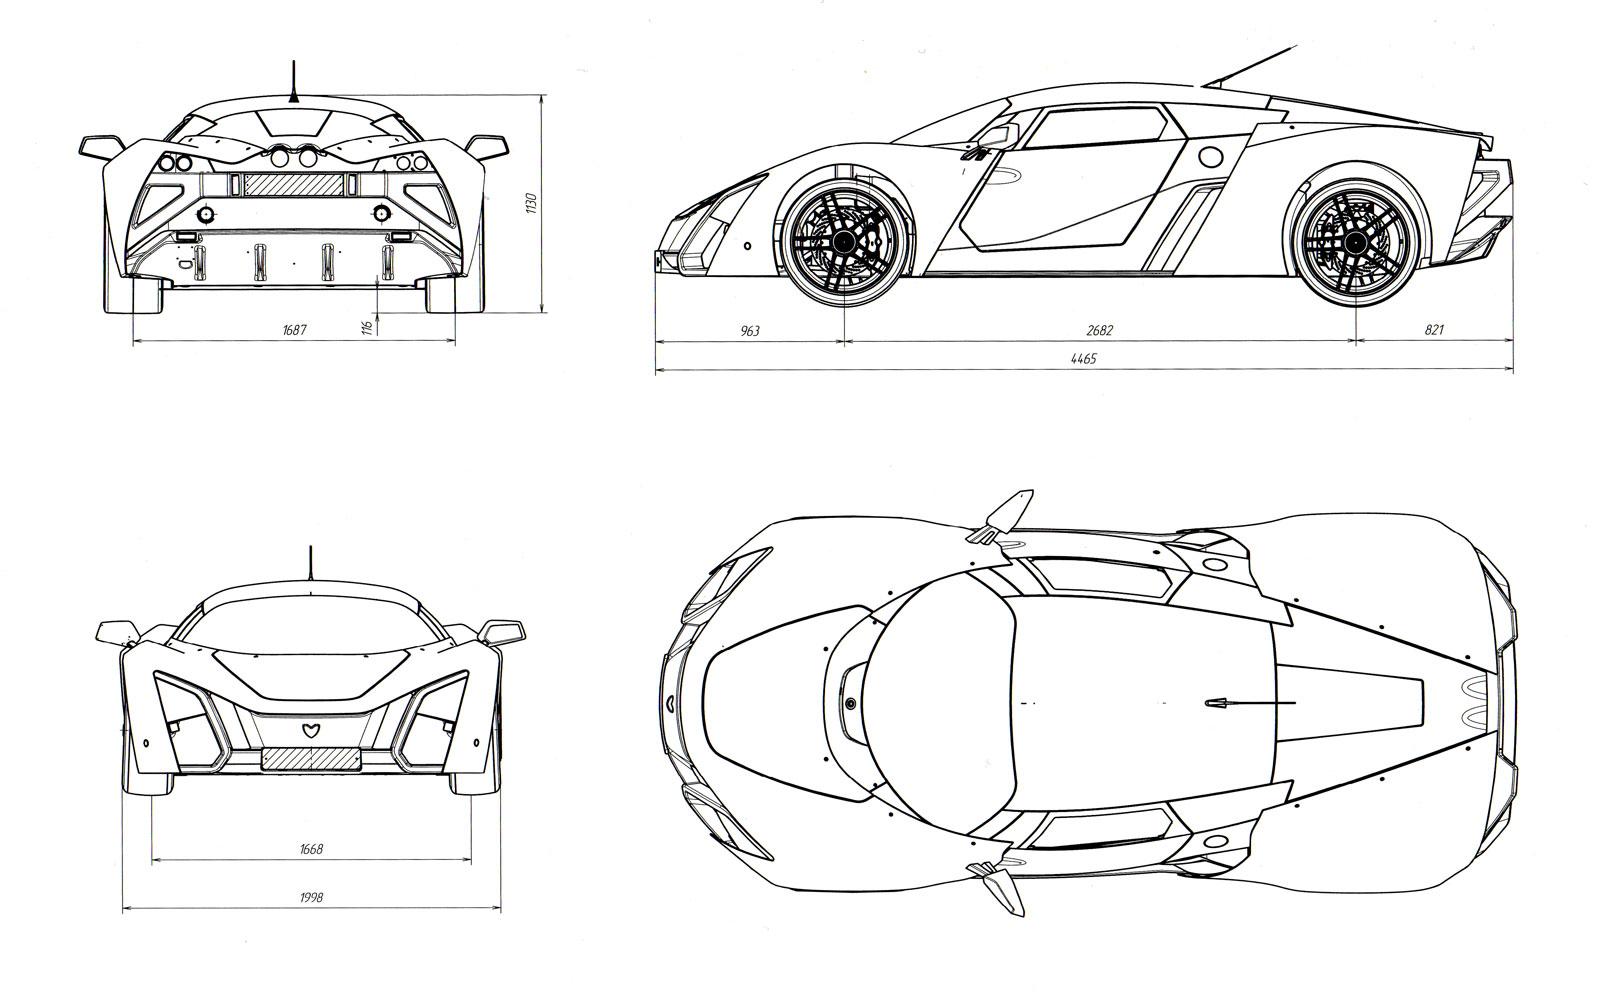 Marussia b2 blueprint car body design marussia b2 blueprint malvernweather Image collections